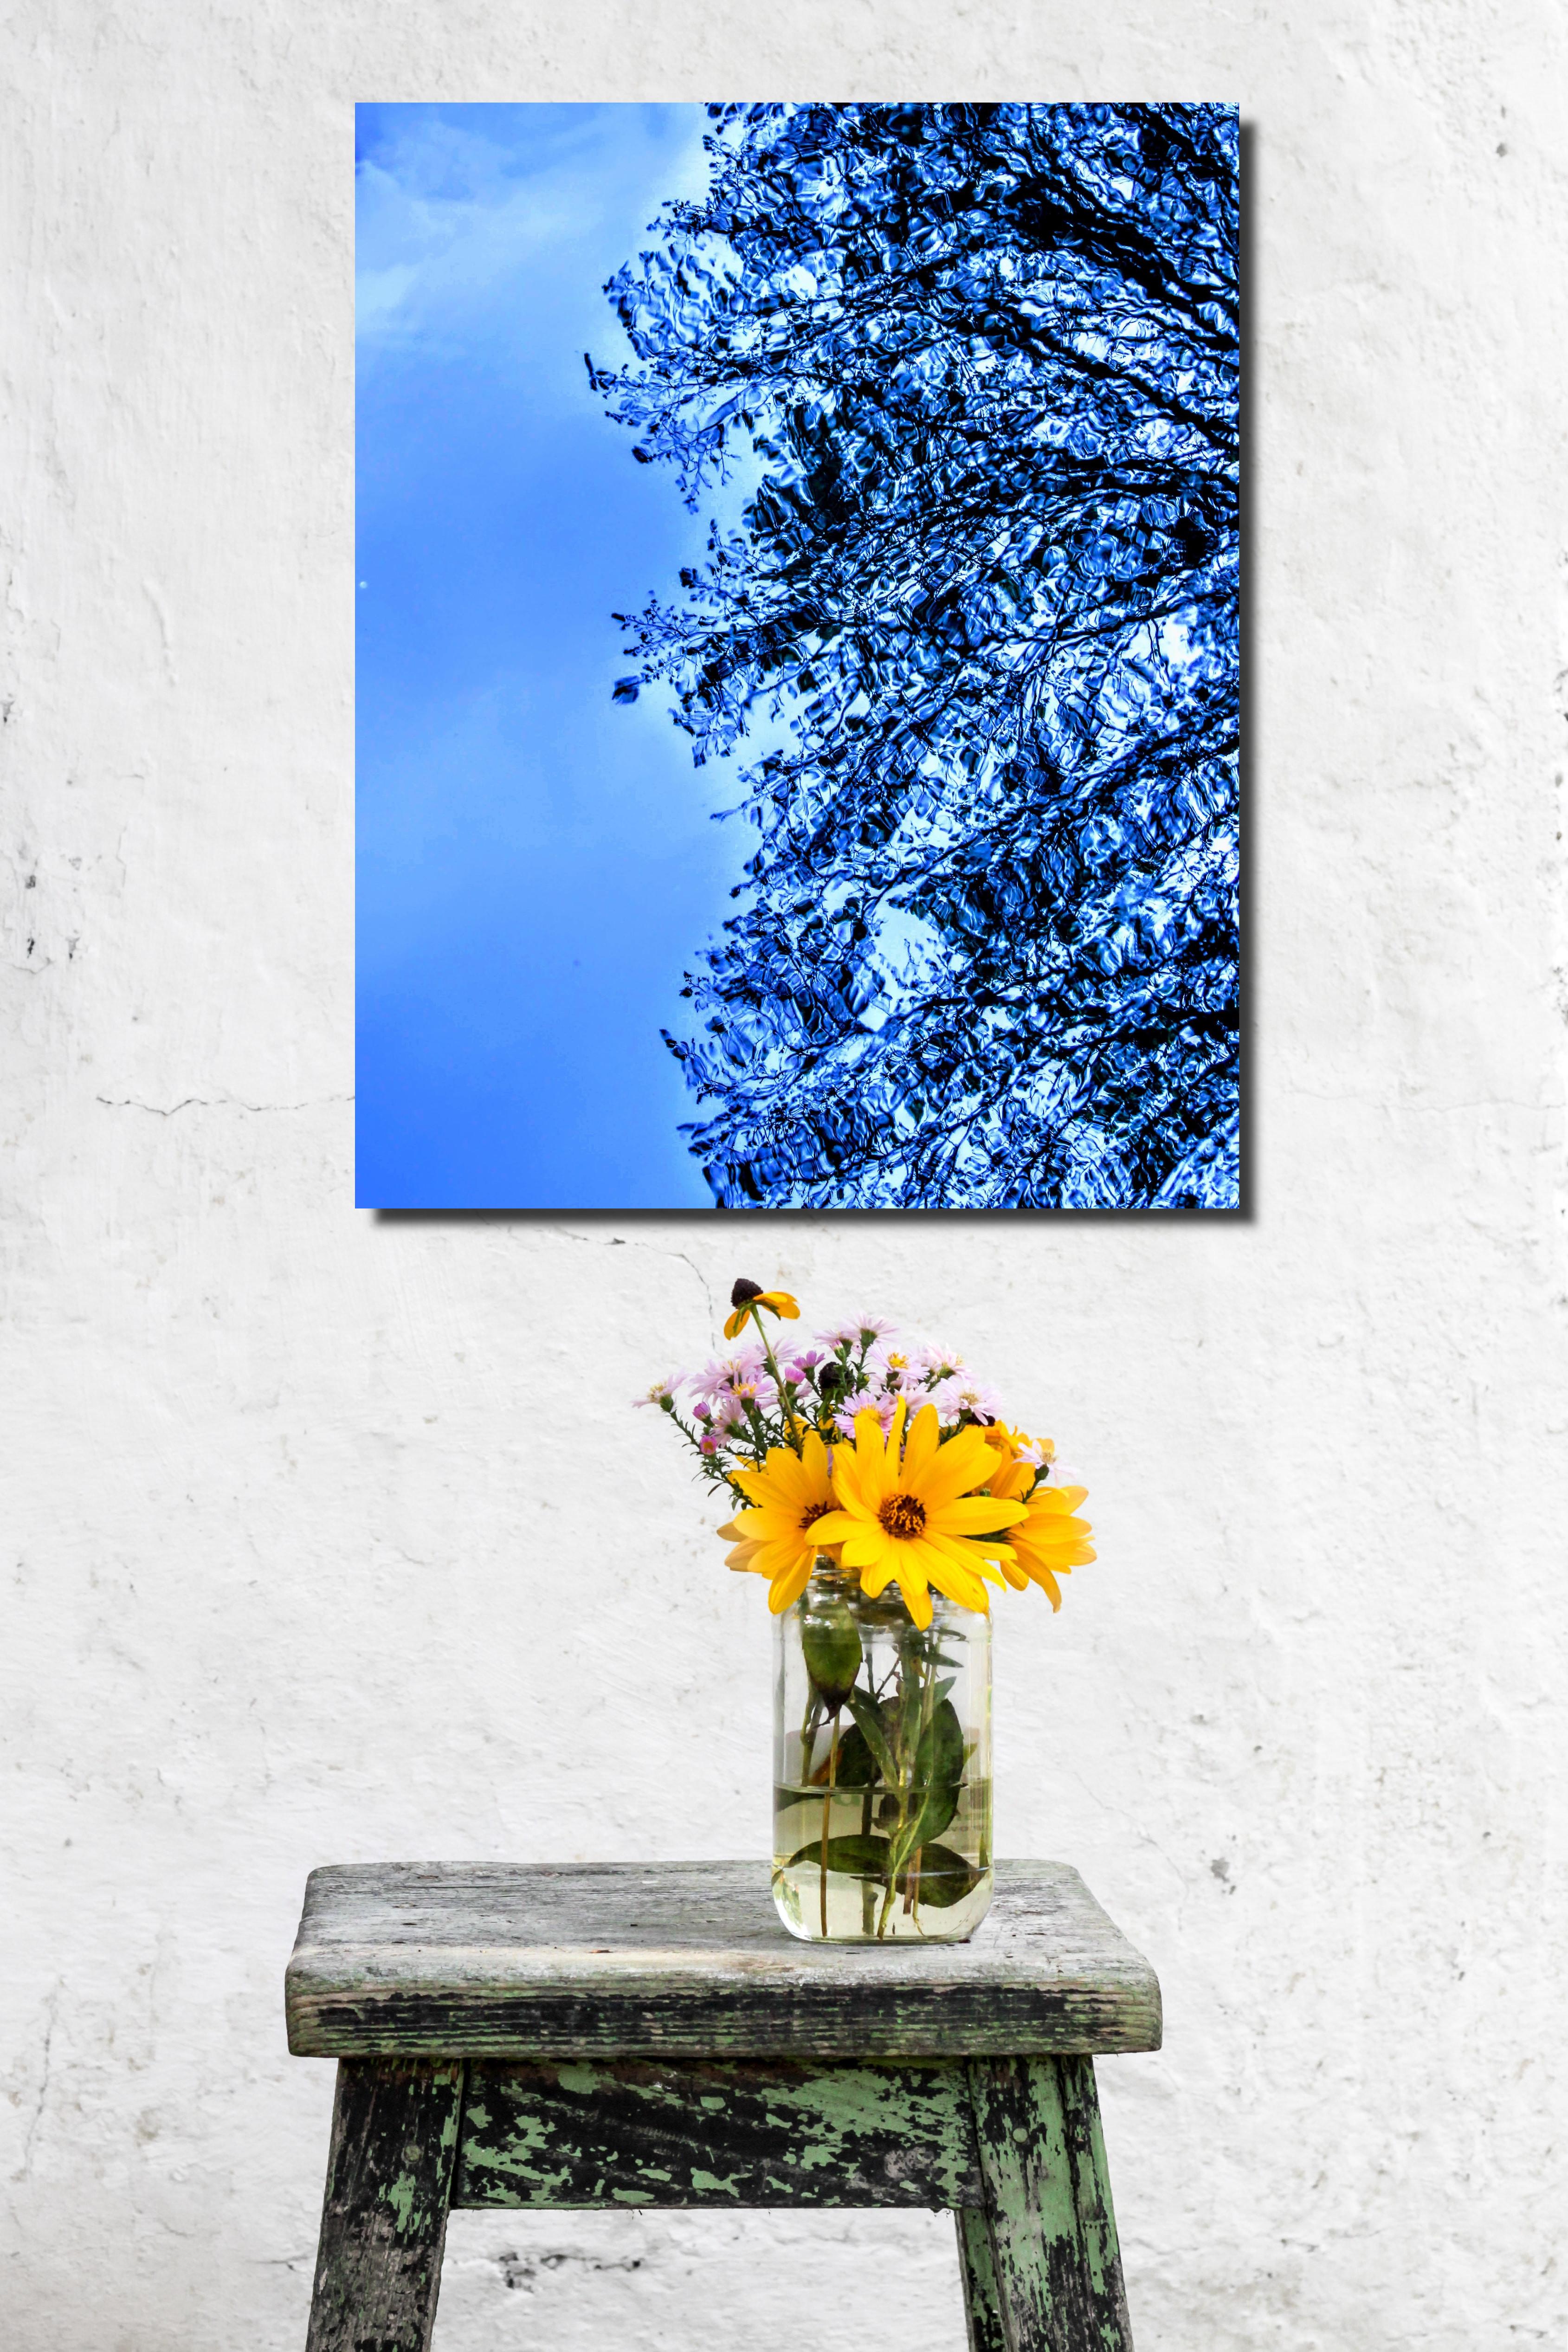 Abstract Blue 1 - Background image: Photo by Kevin Lehtla on Unsplash